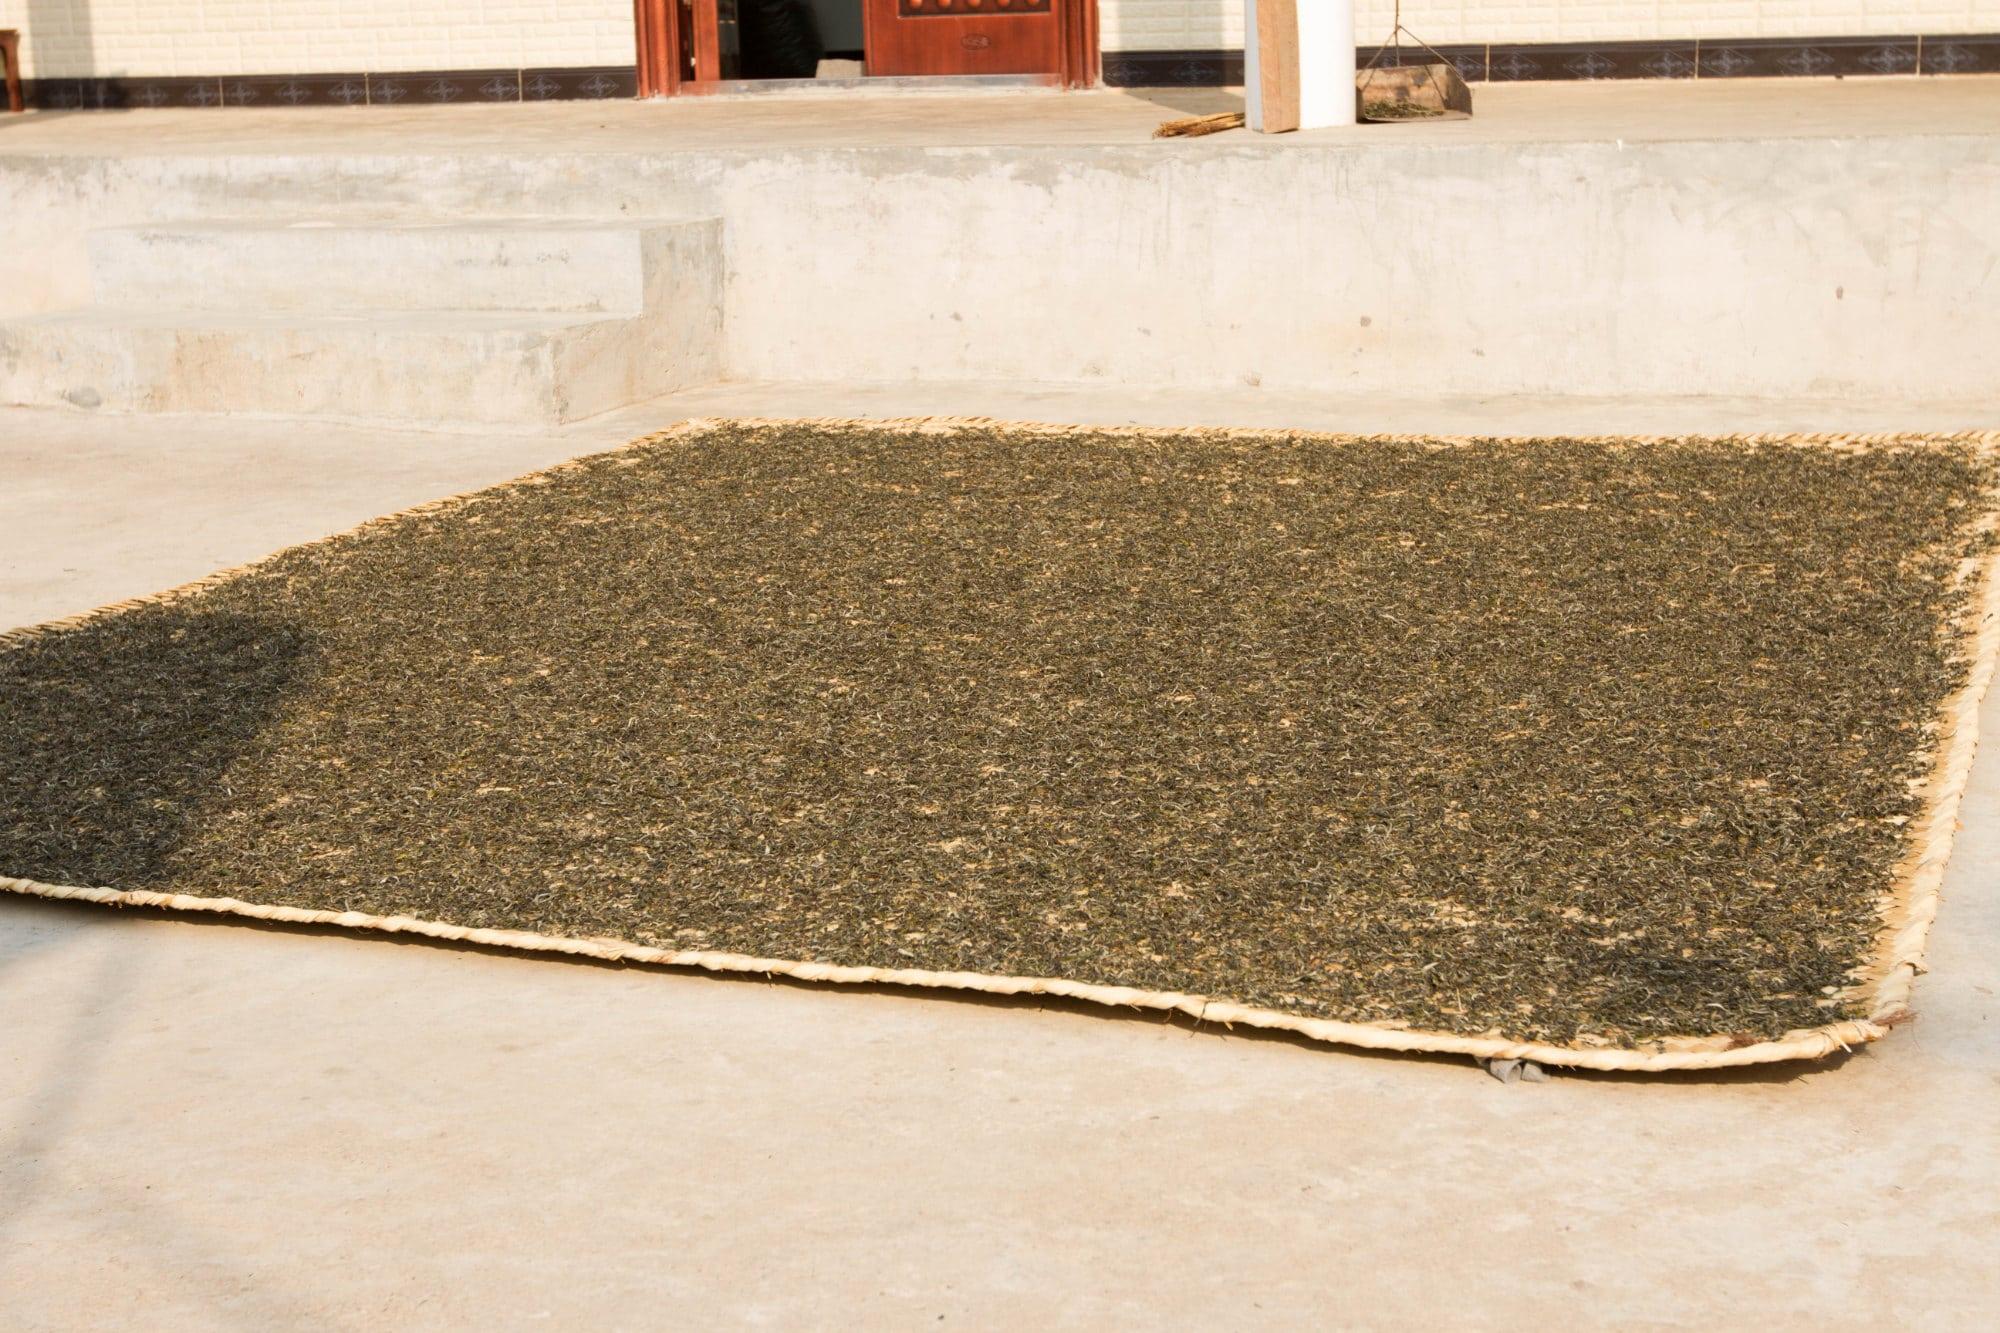 Tealet's Michael Petersen took this photo of tea sun drying